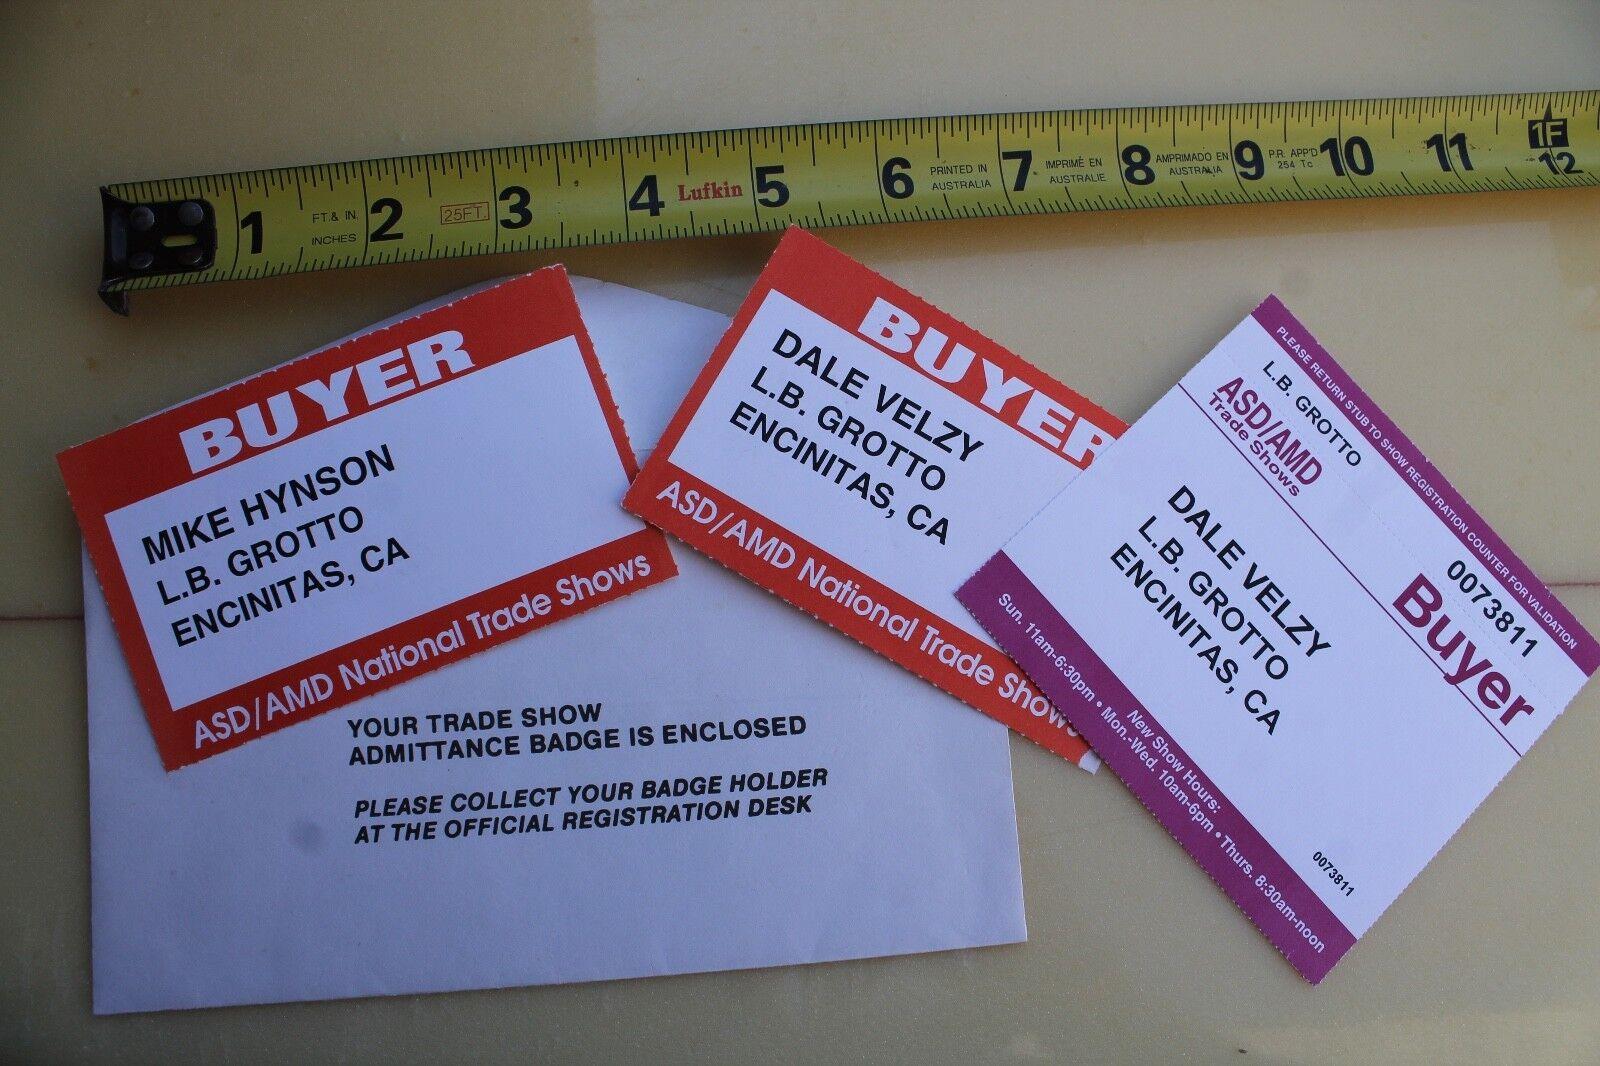 Dale Velzy   Mike Hynson Longboard Gredto Encinitas Trade Show Badge - Lot of 3